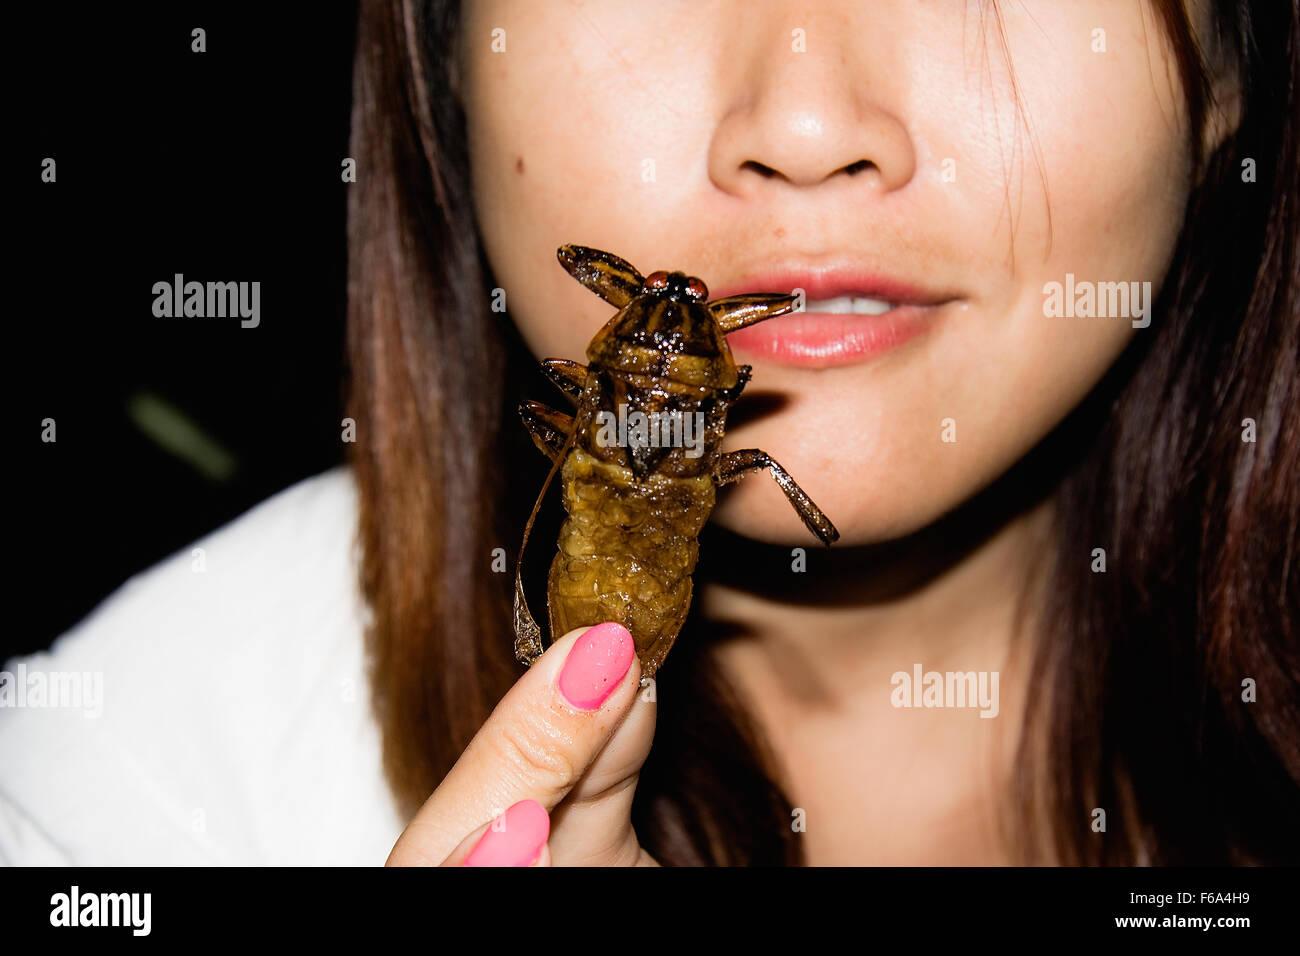 asiatico ladyboy sesso vids